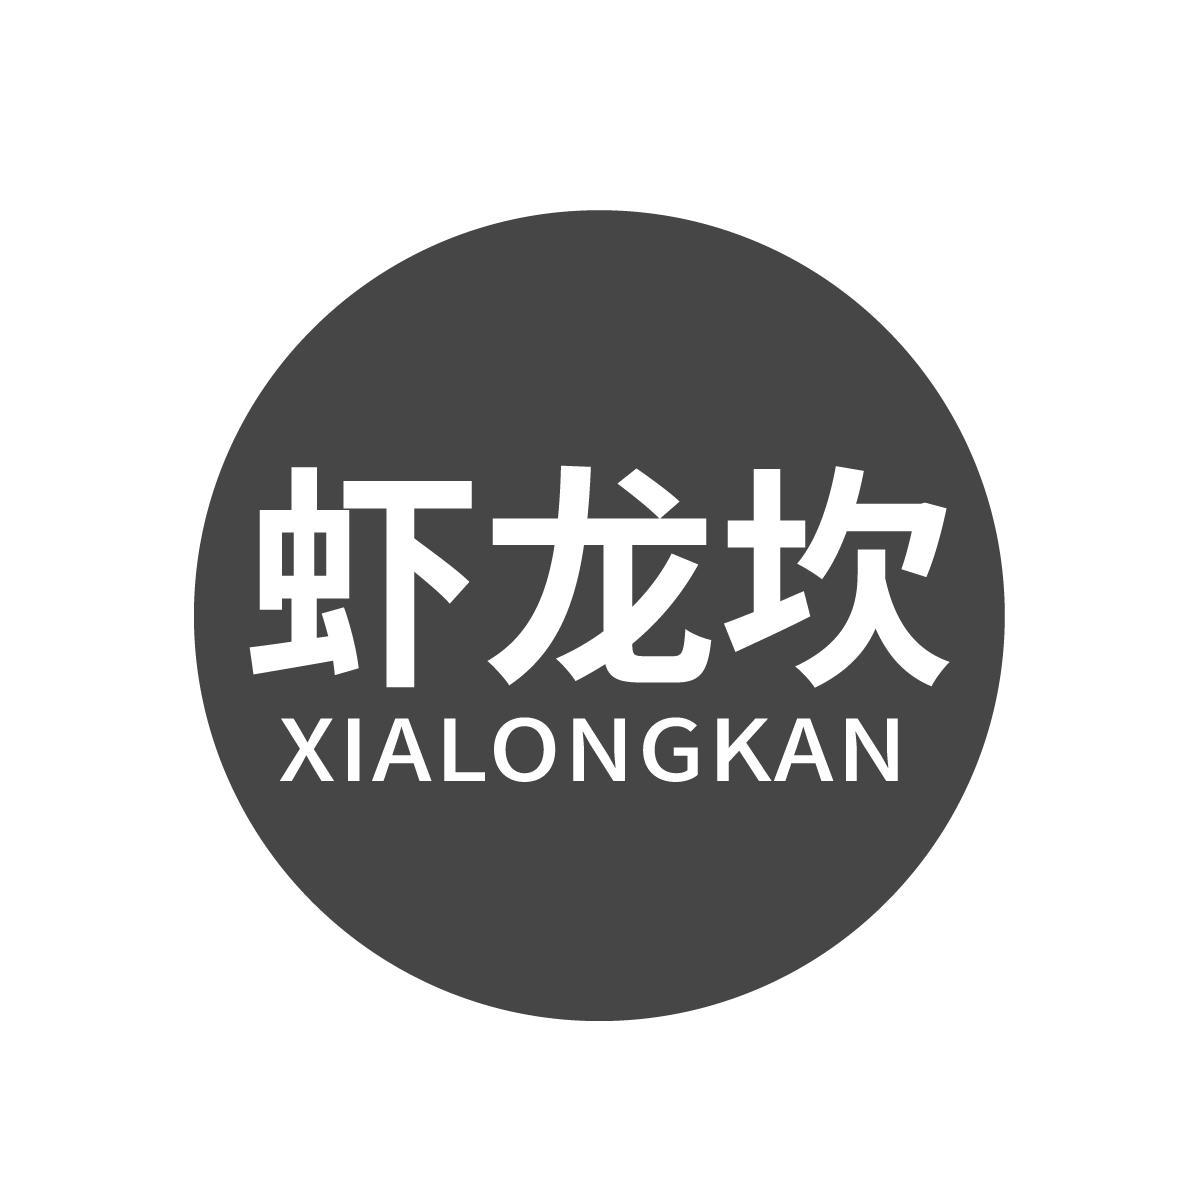 虾龙坎XIAOLONGKAN